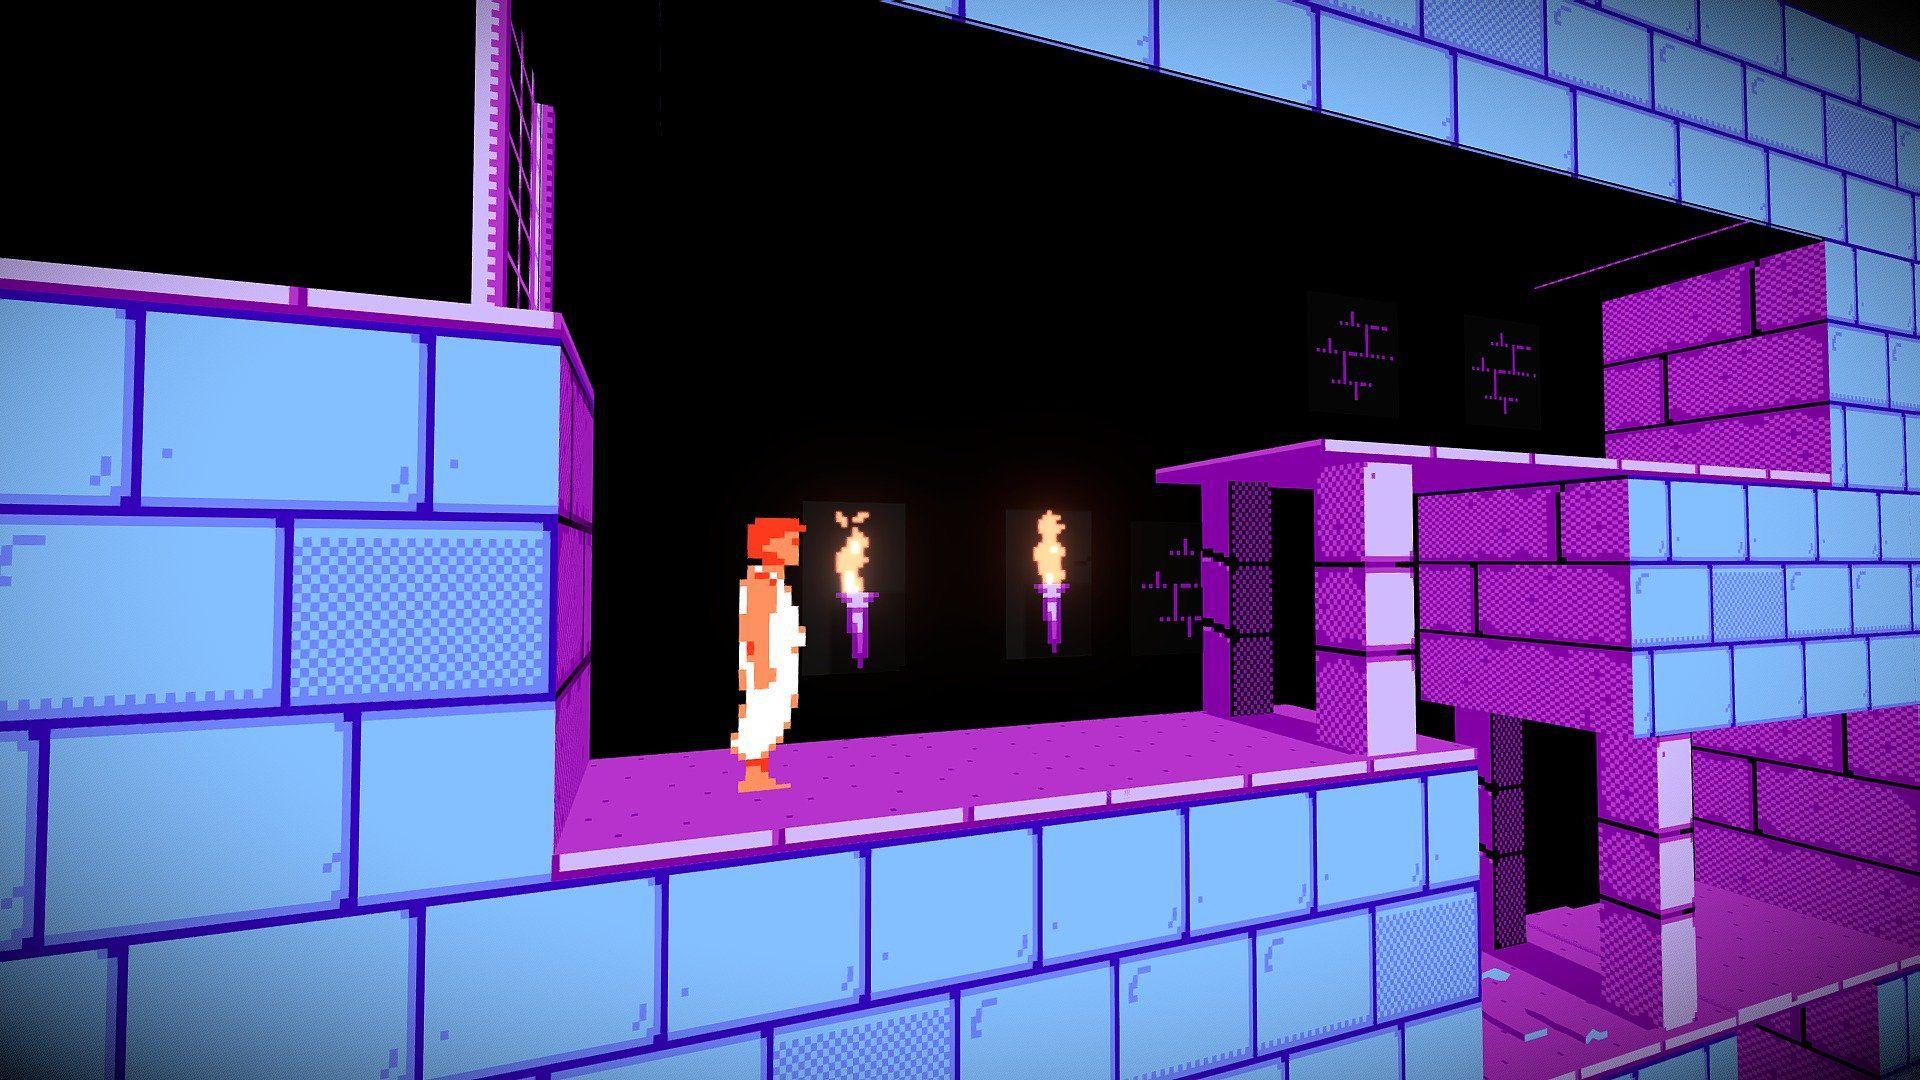 Prince Of Persia Level 1 Nes Fan Art By Funkfz Prince Of Persia Fan Art Persia